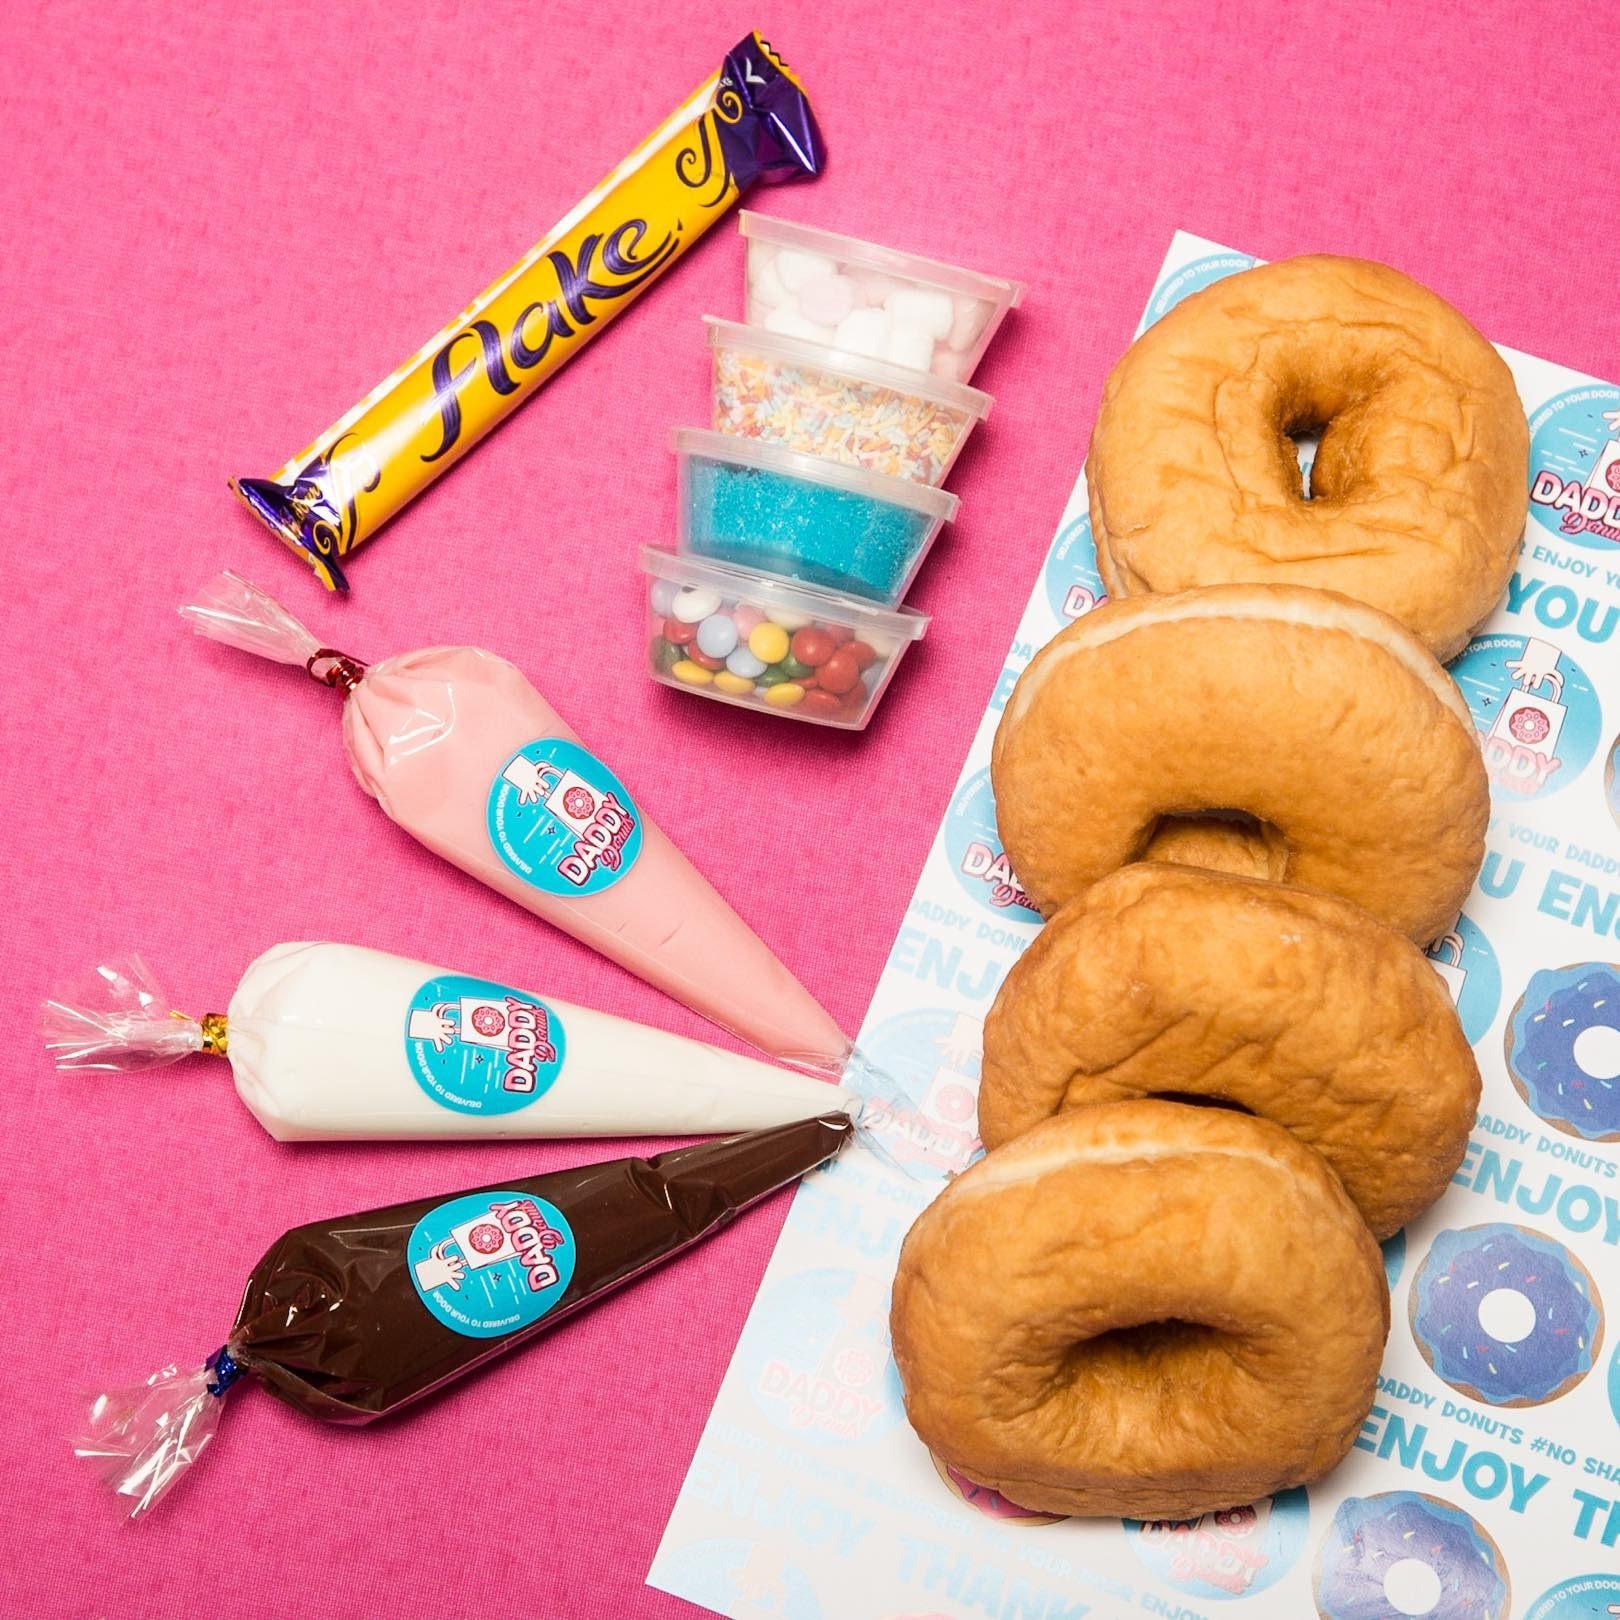 birthday gift from daddy donuts buy doug